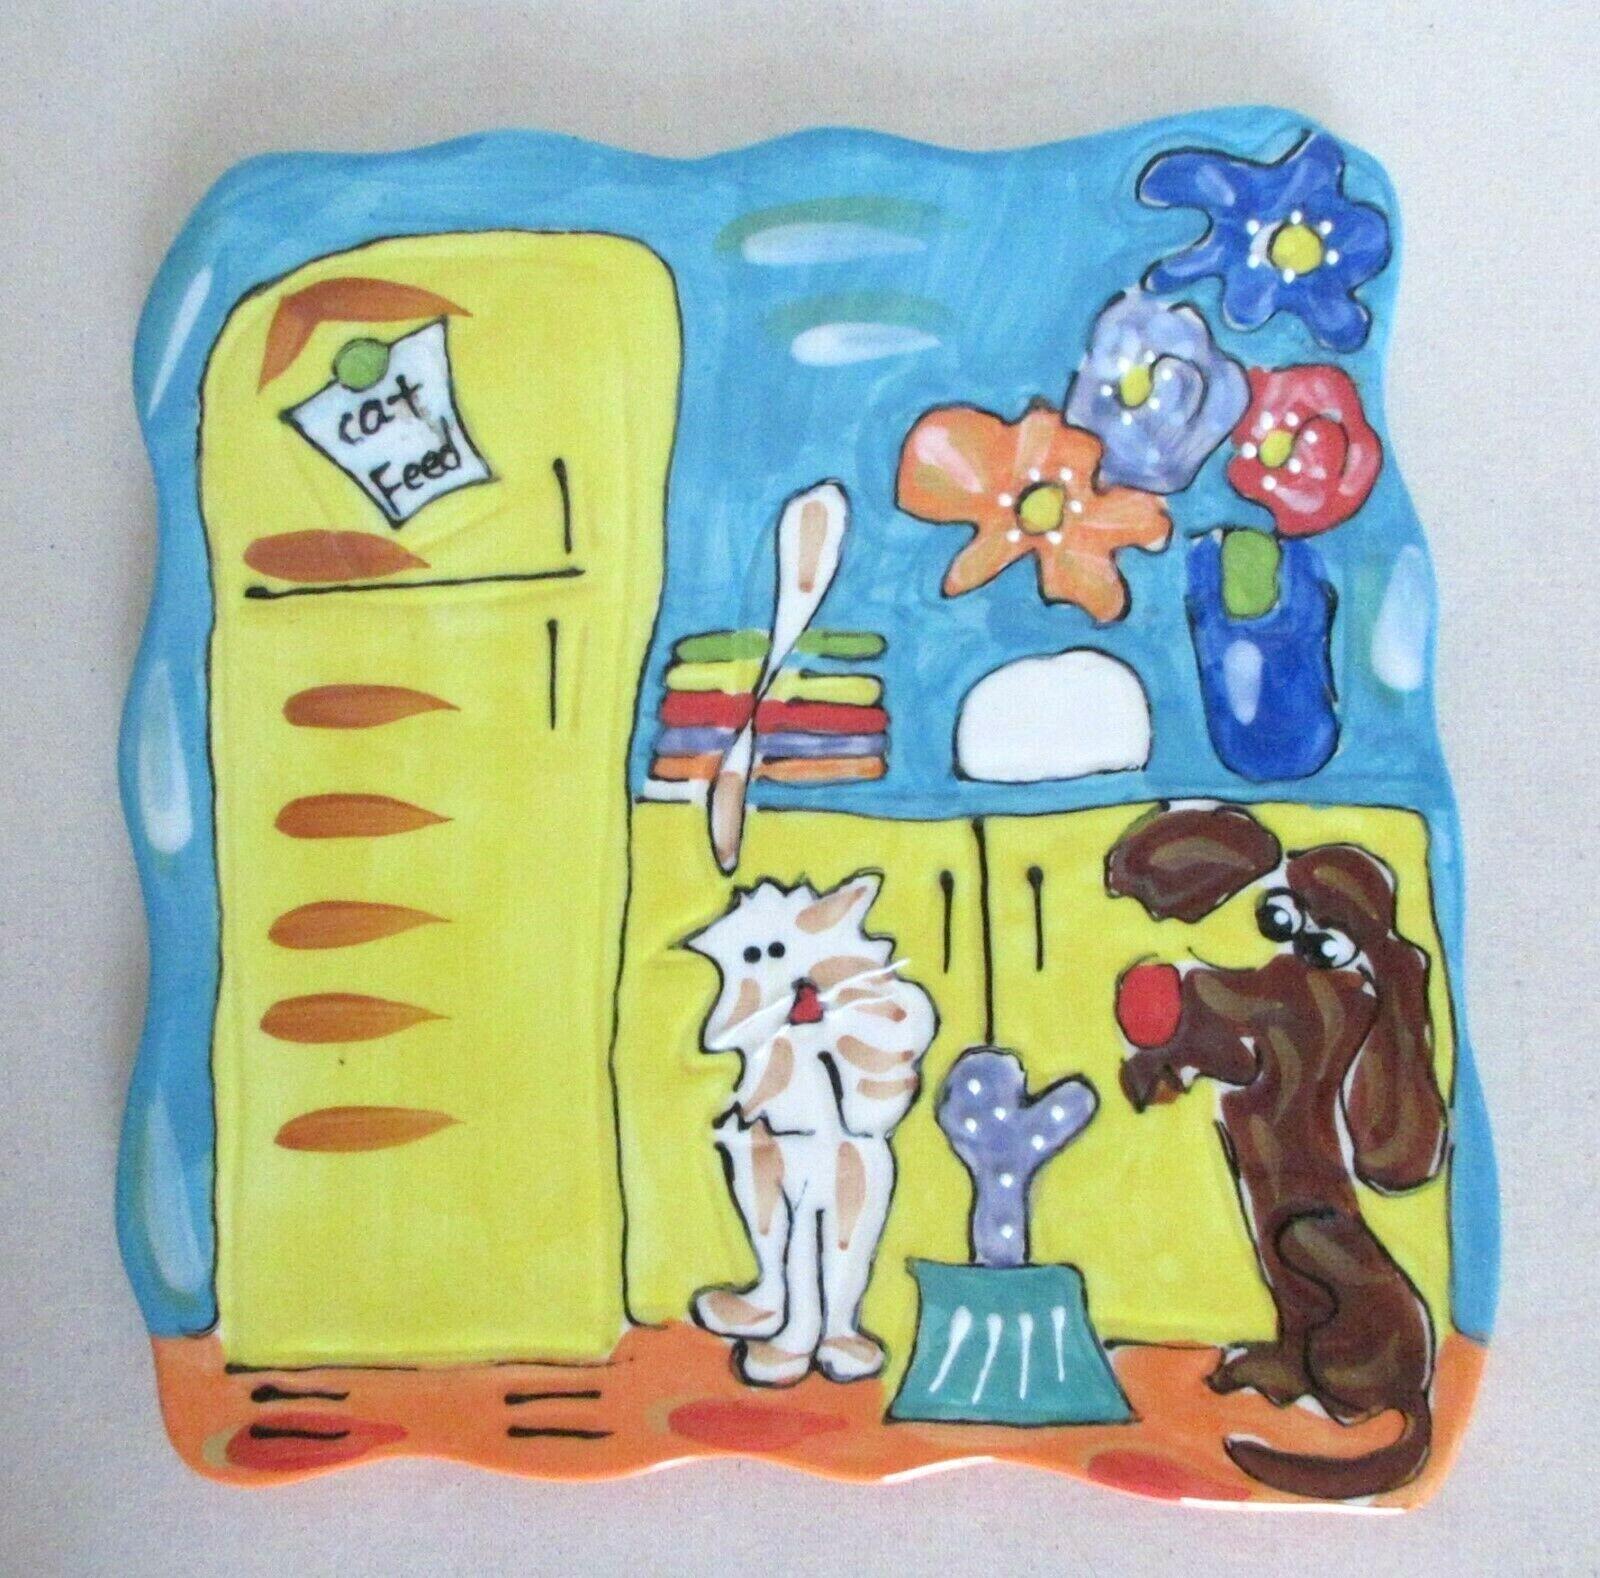 Coyne s 2002 Debby Carman Minch Patrol Trivet Wall Hanging Cats Dogs - $13.99